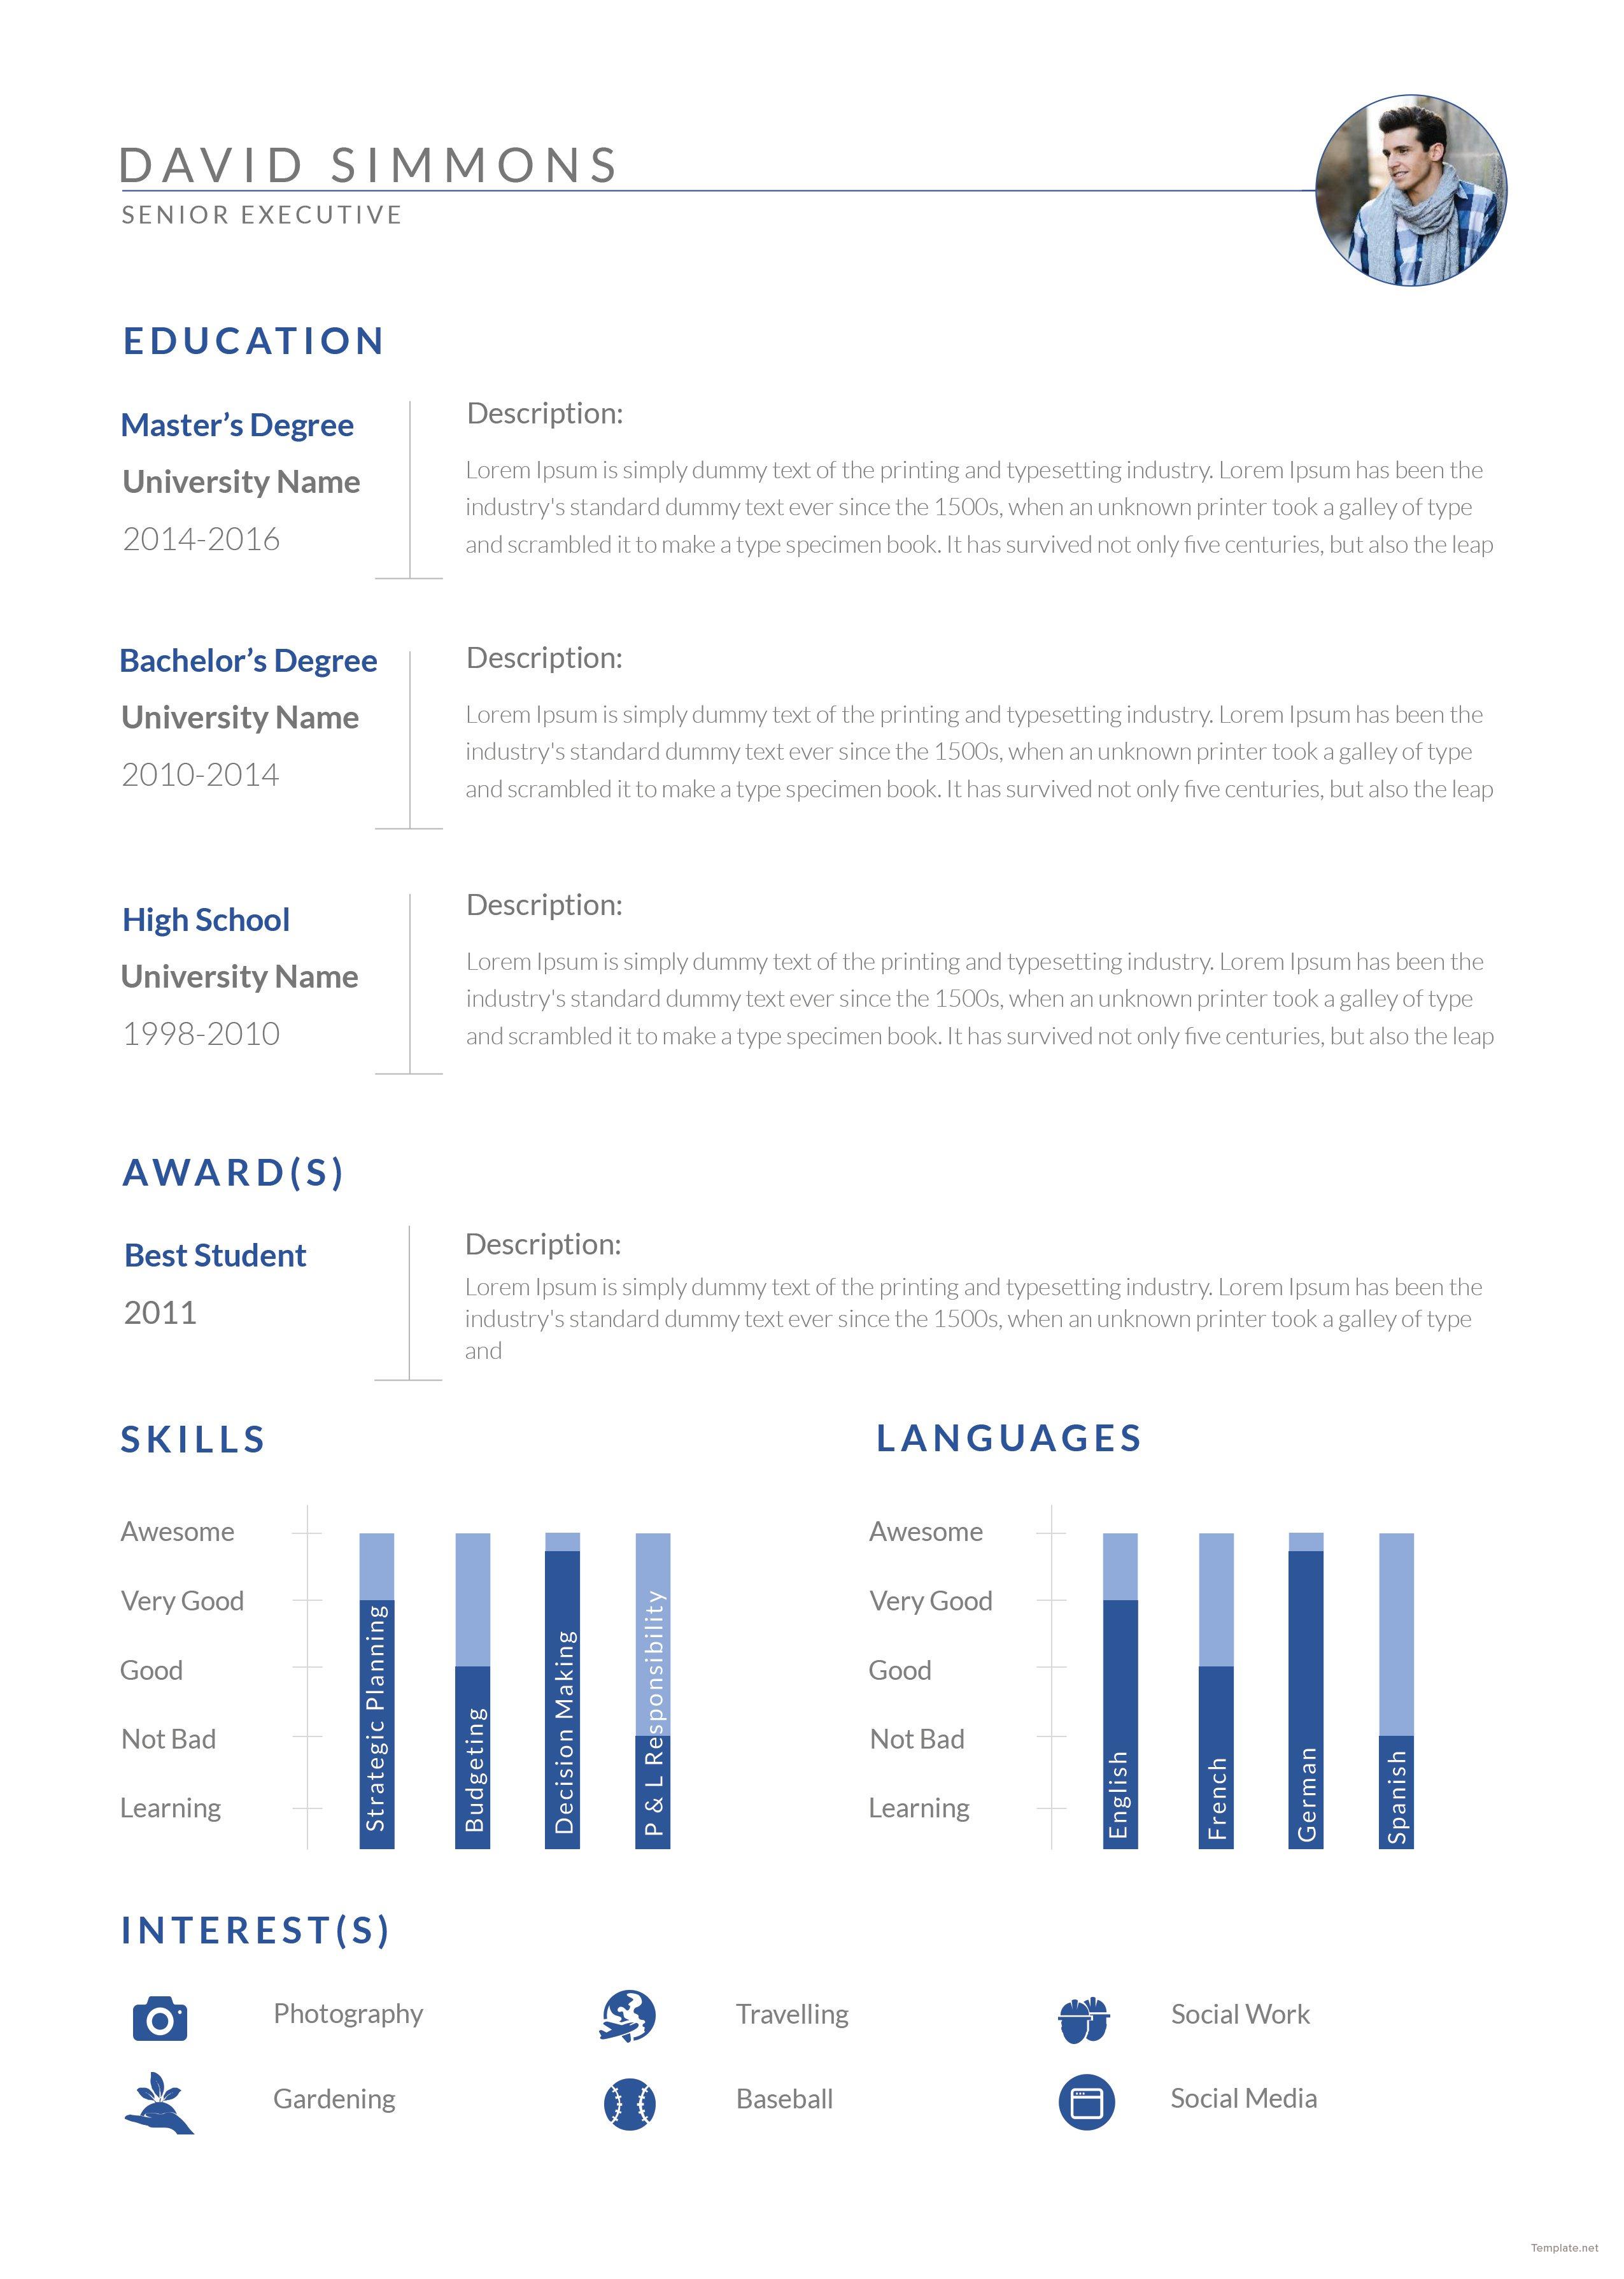 Free Senior Executive Resume Template in Adobe Photoshop, InDesign ...